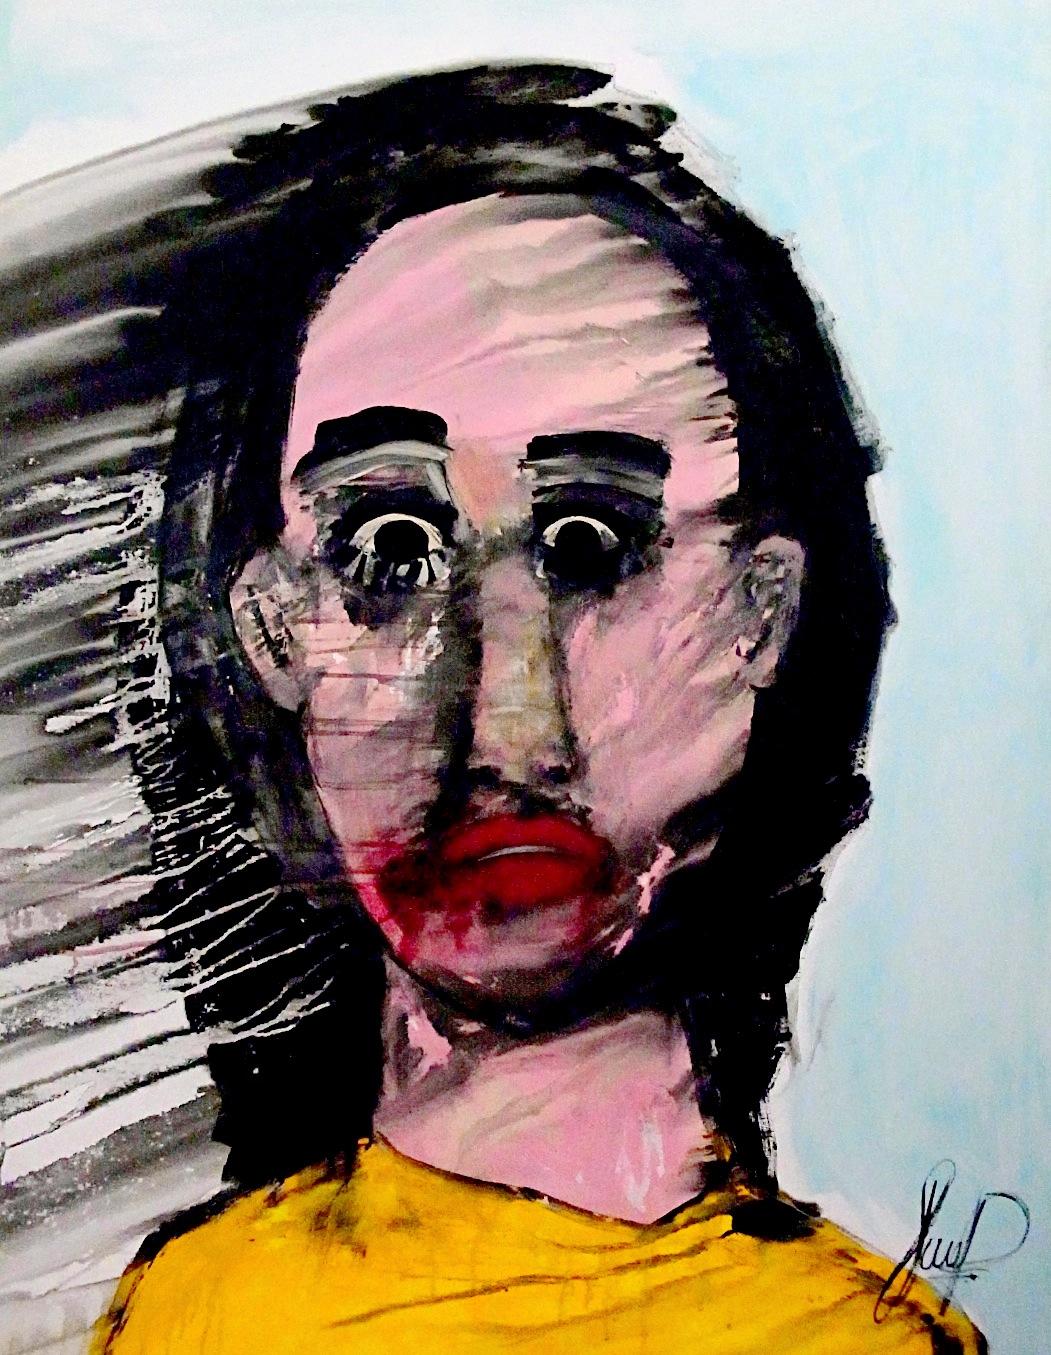 Fright, 2014